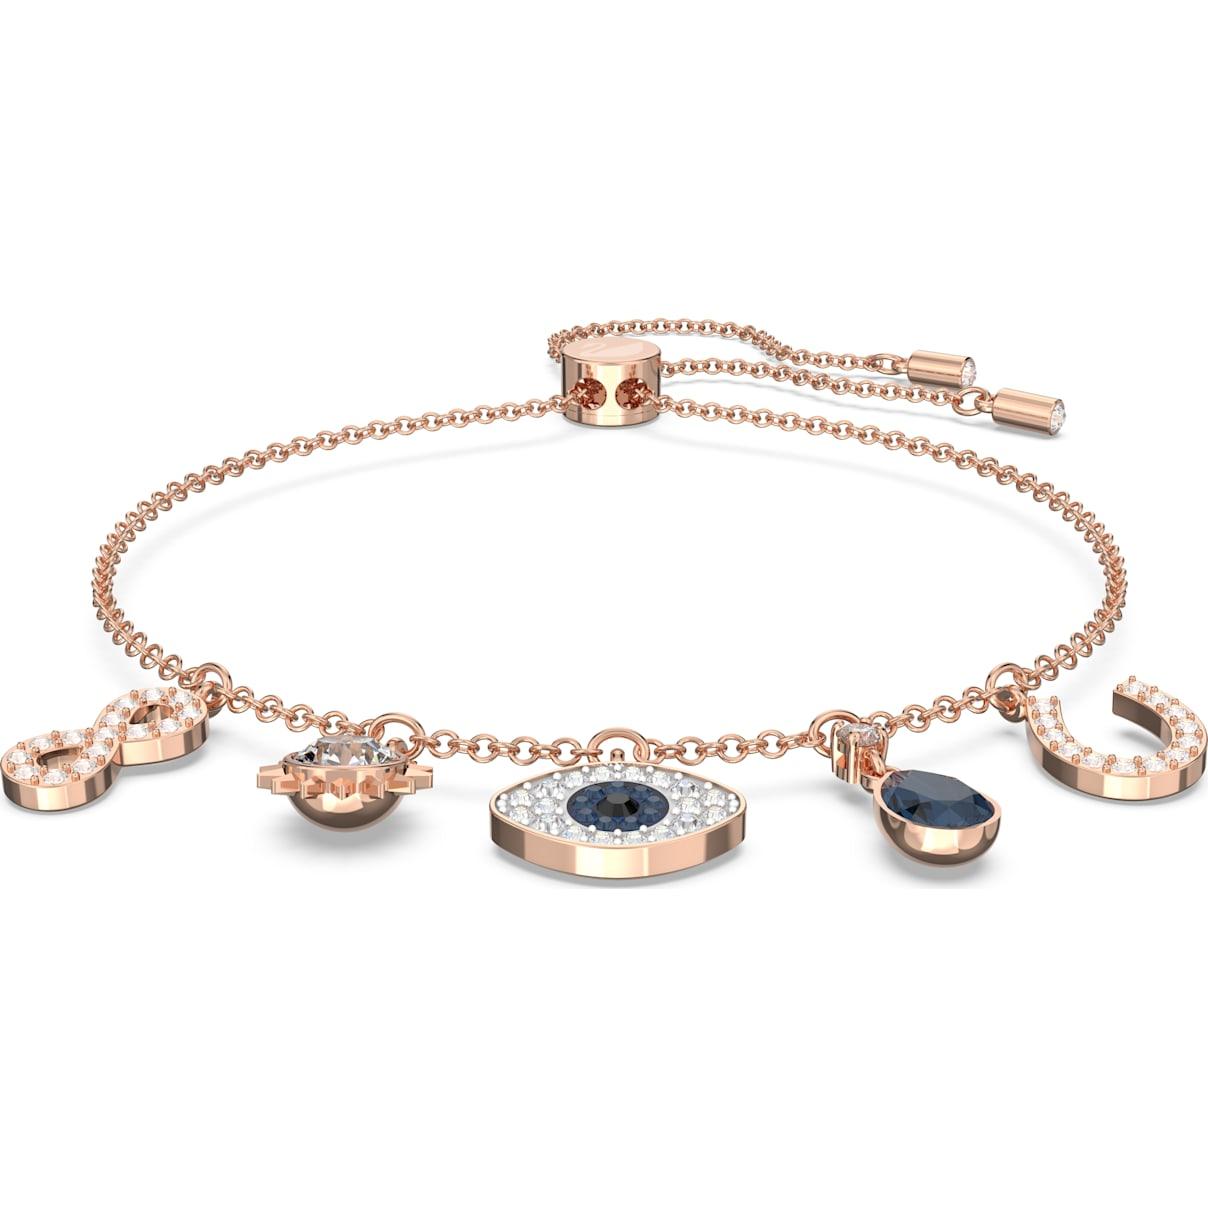 Swarovski Swarovski Symbolic Bracelet, Multi-colored, Rose-gold tone plated